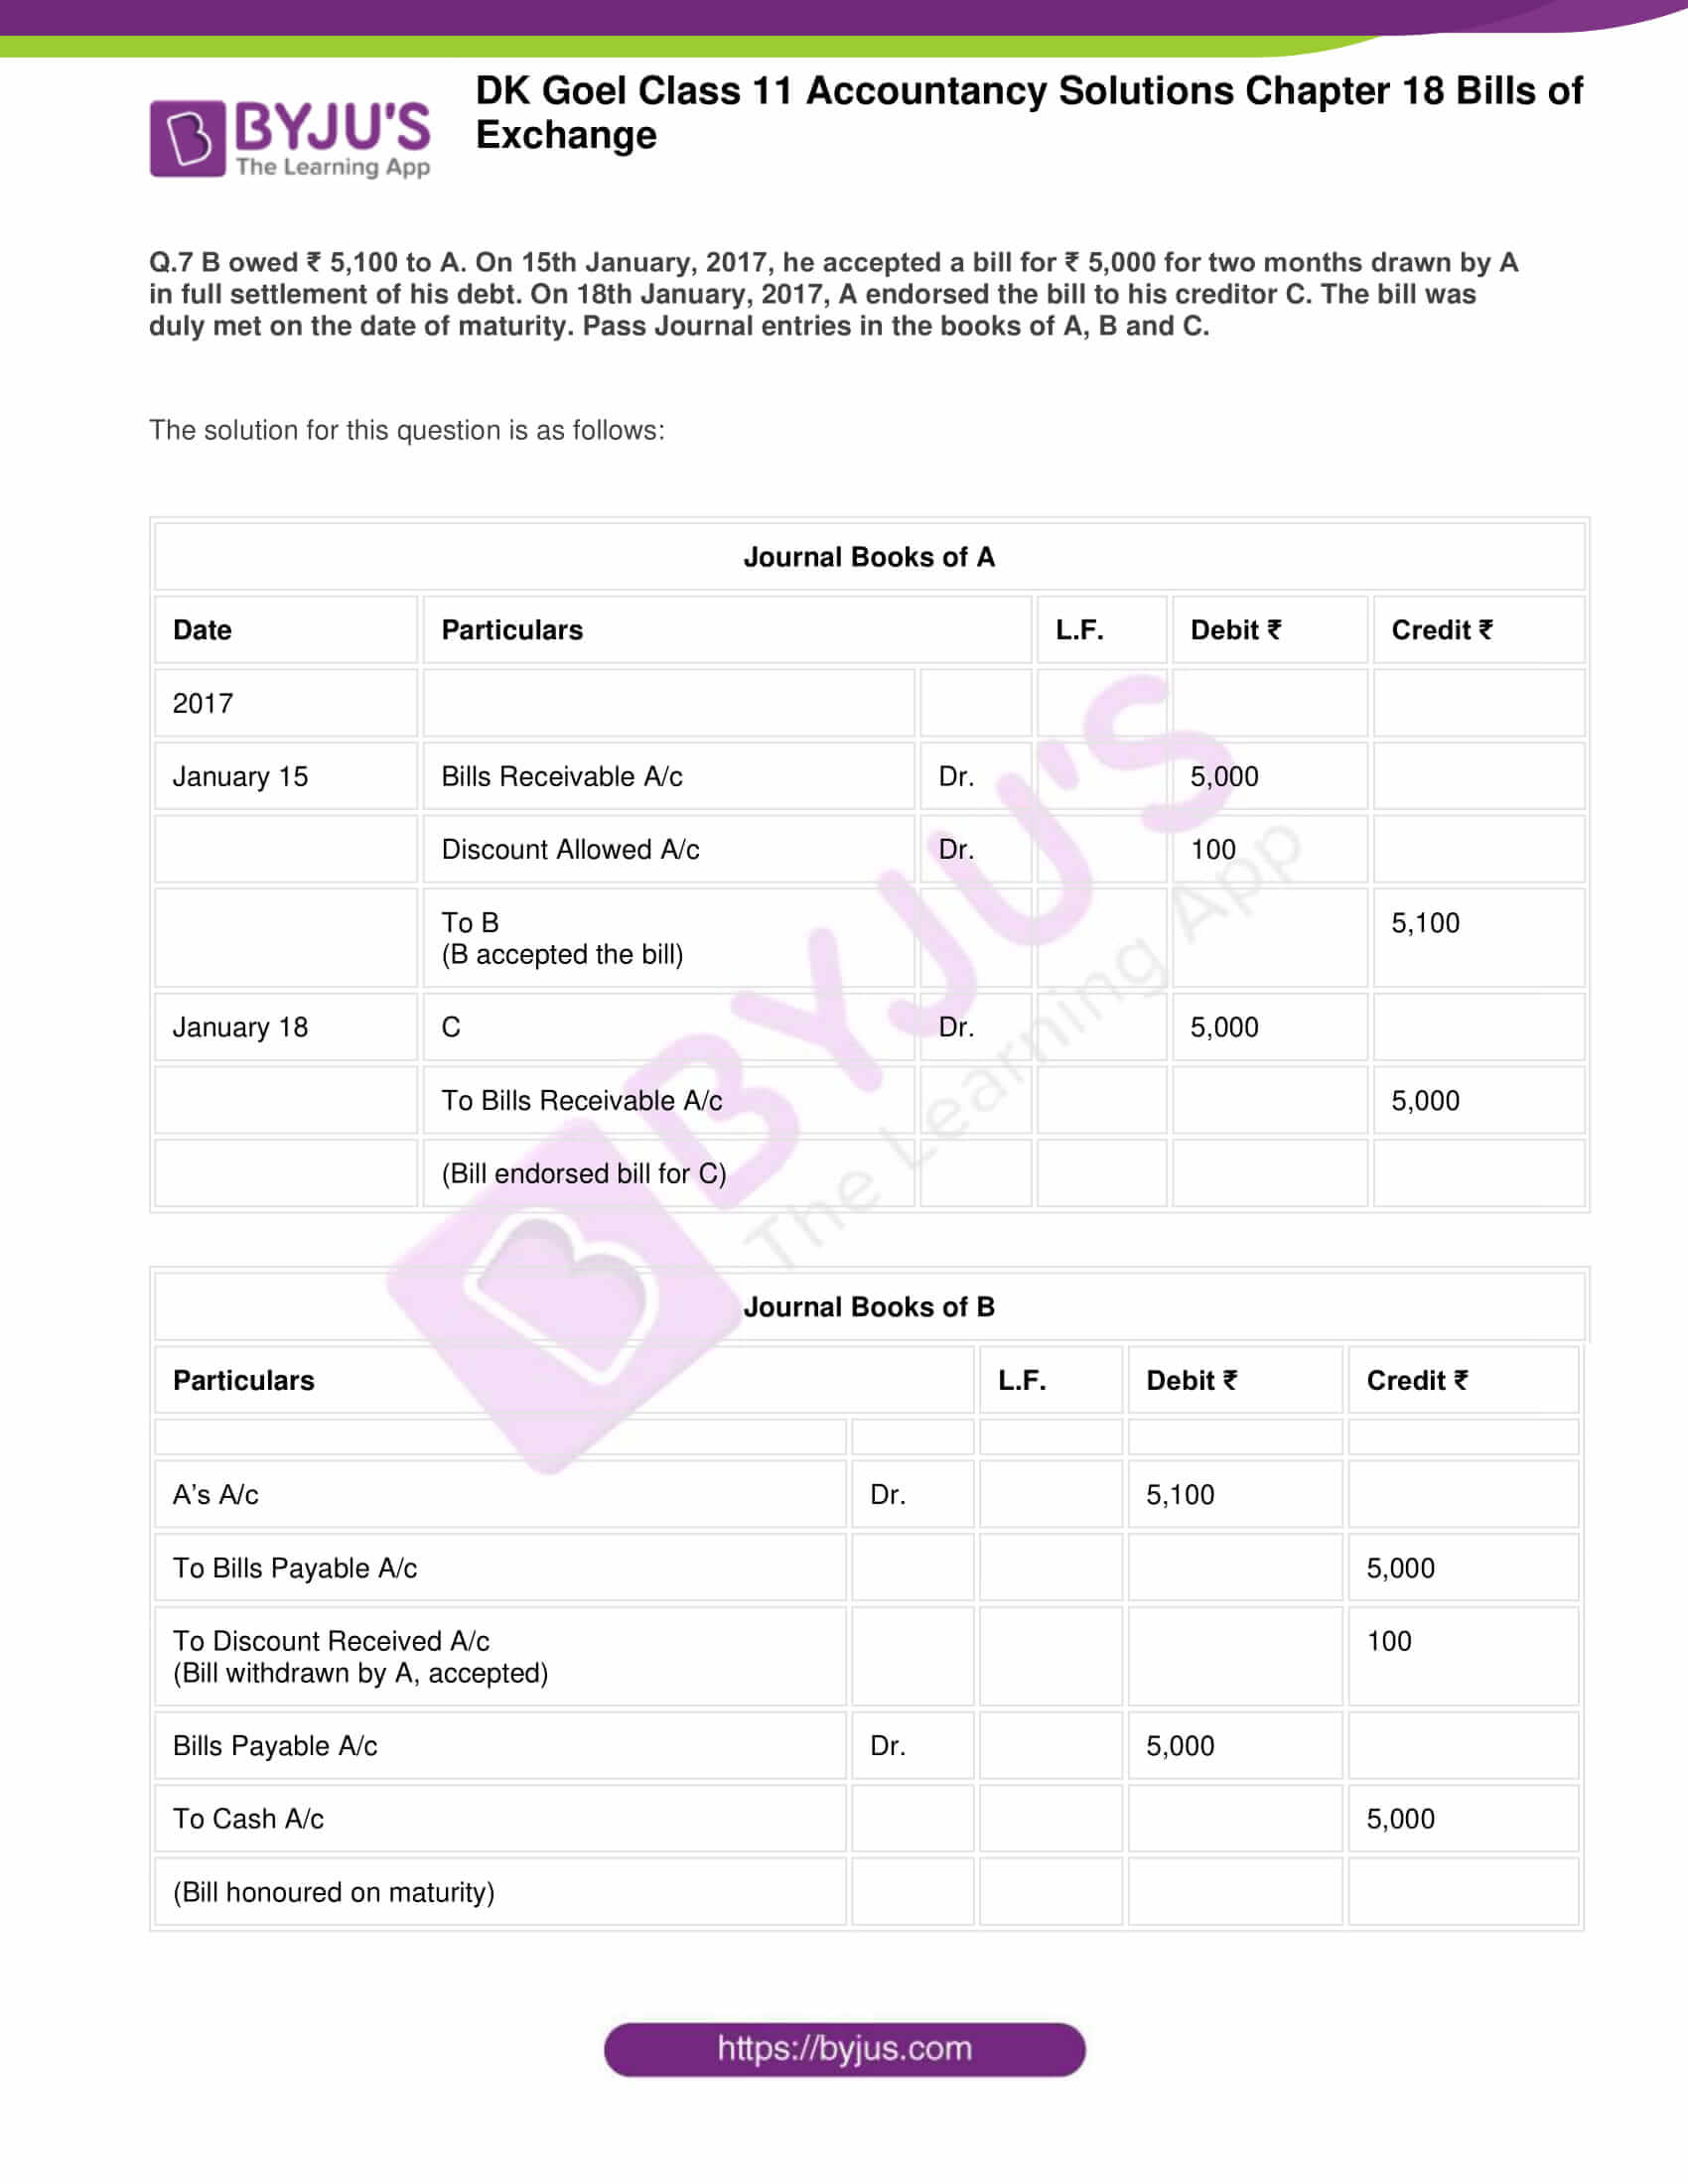 dk goel class 11 accountancy solutions chapter 18 011